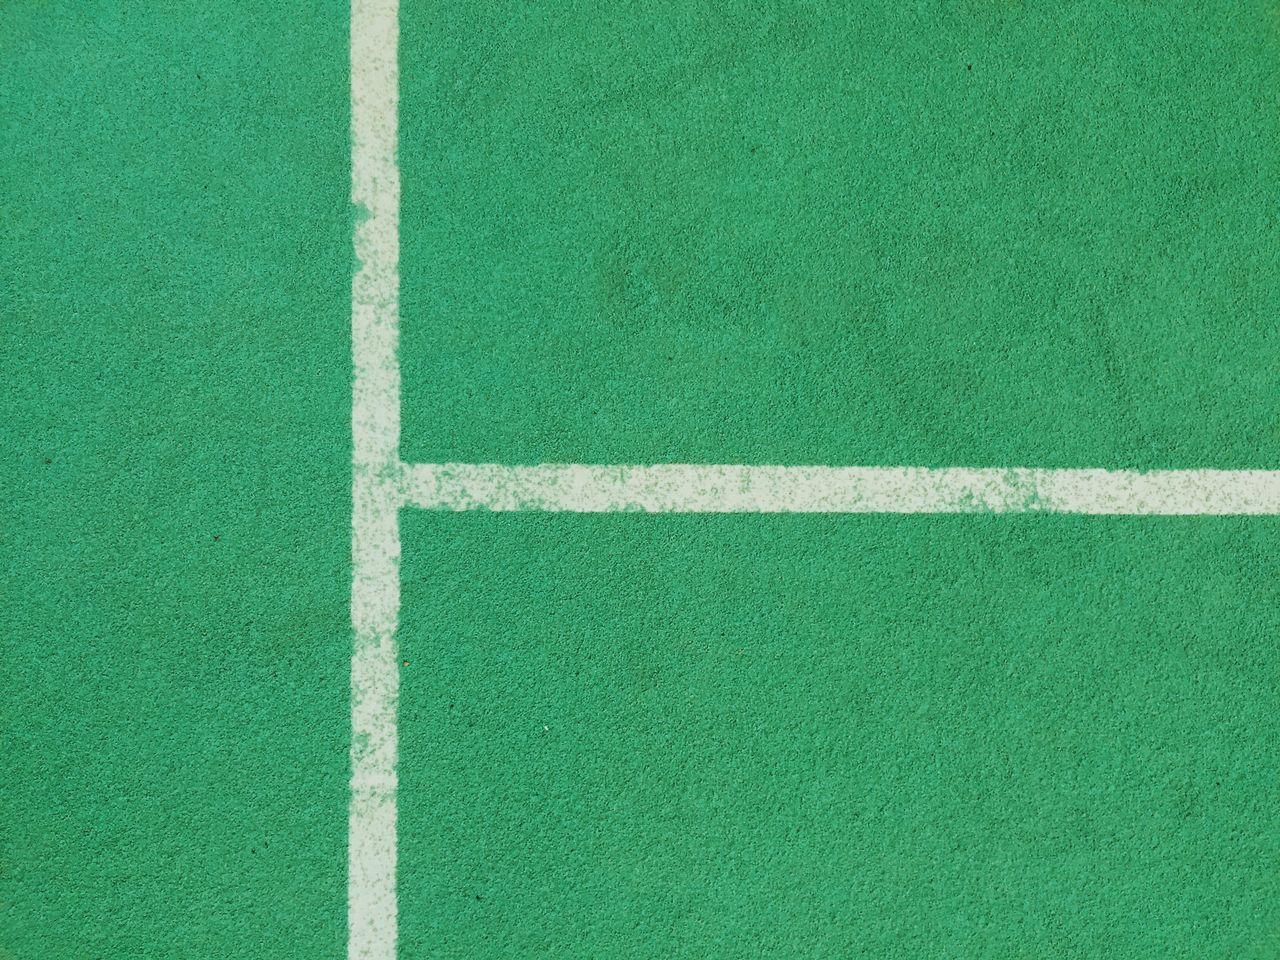 Tennis Ace! Matchball Court Wimbledon Textures And Surfaces Minimalism Floortraits